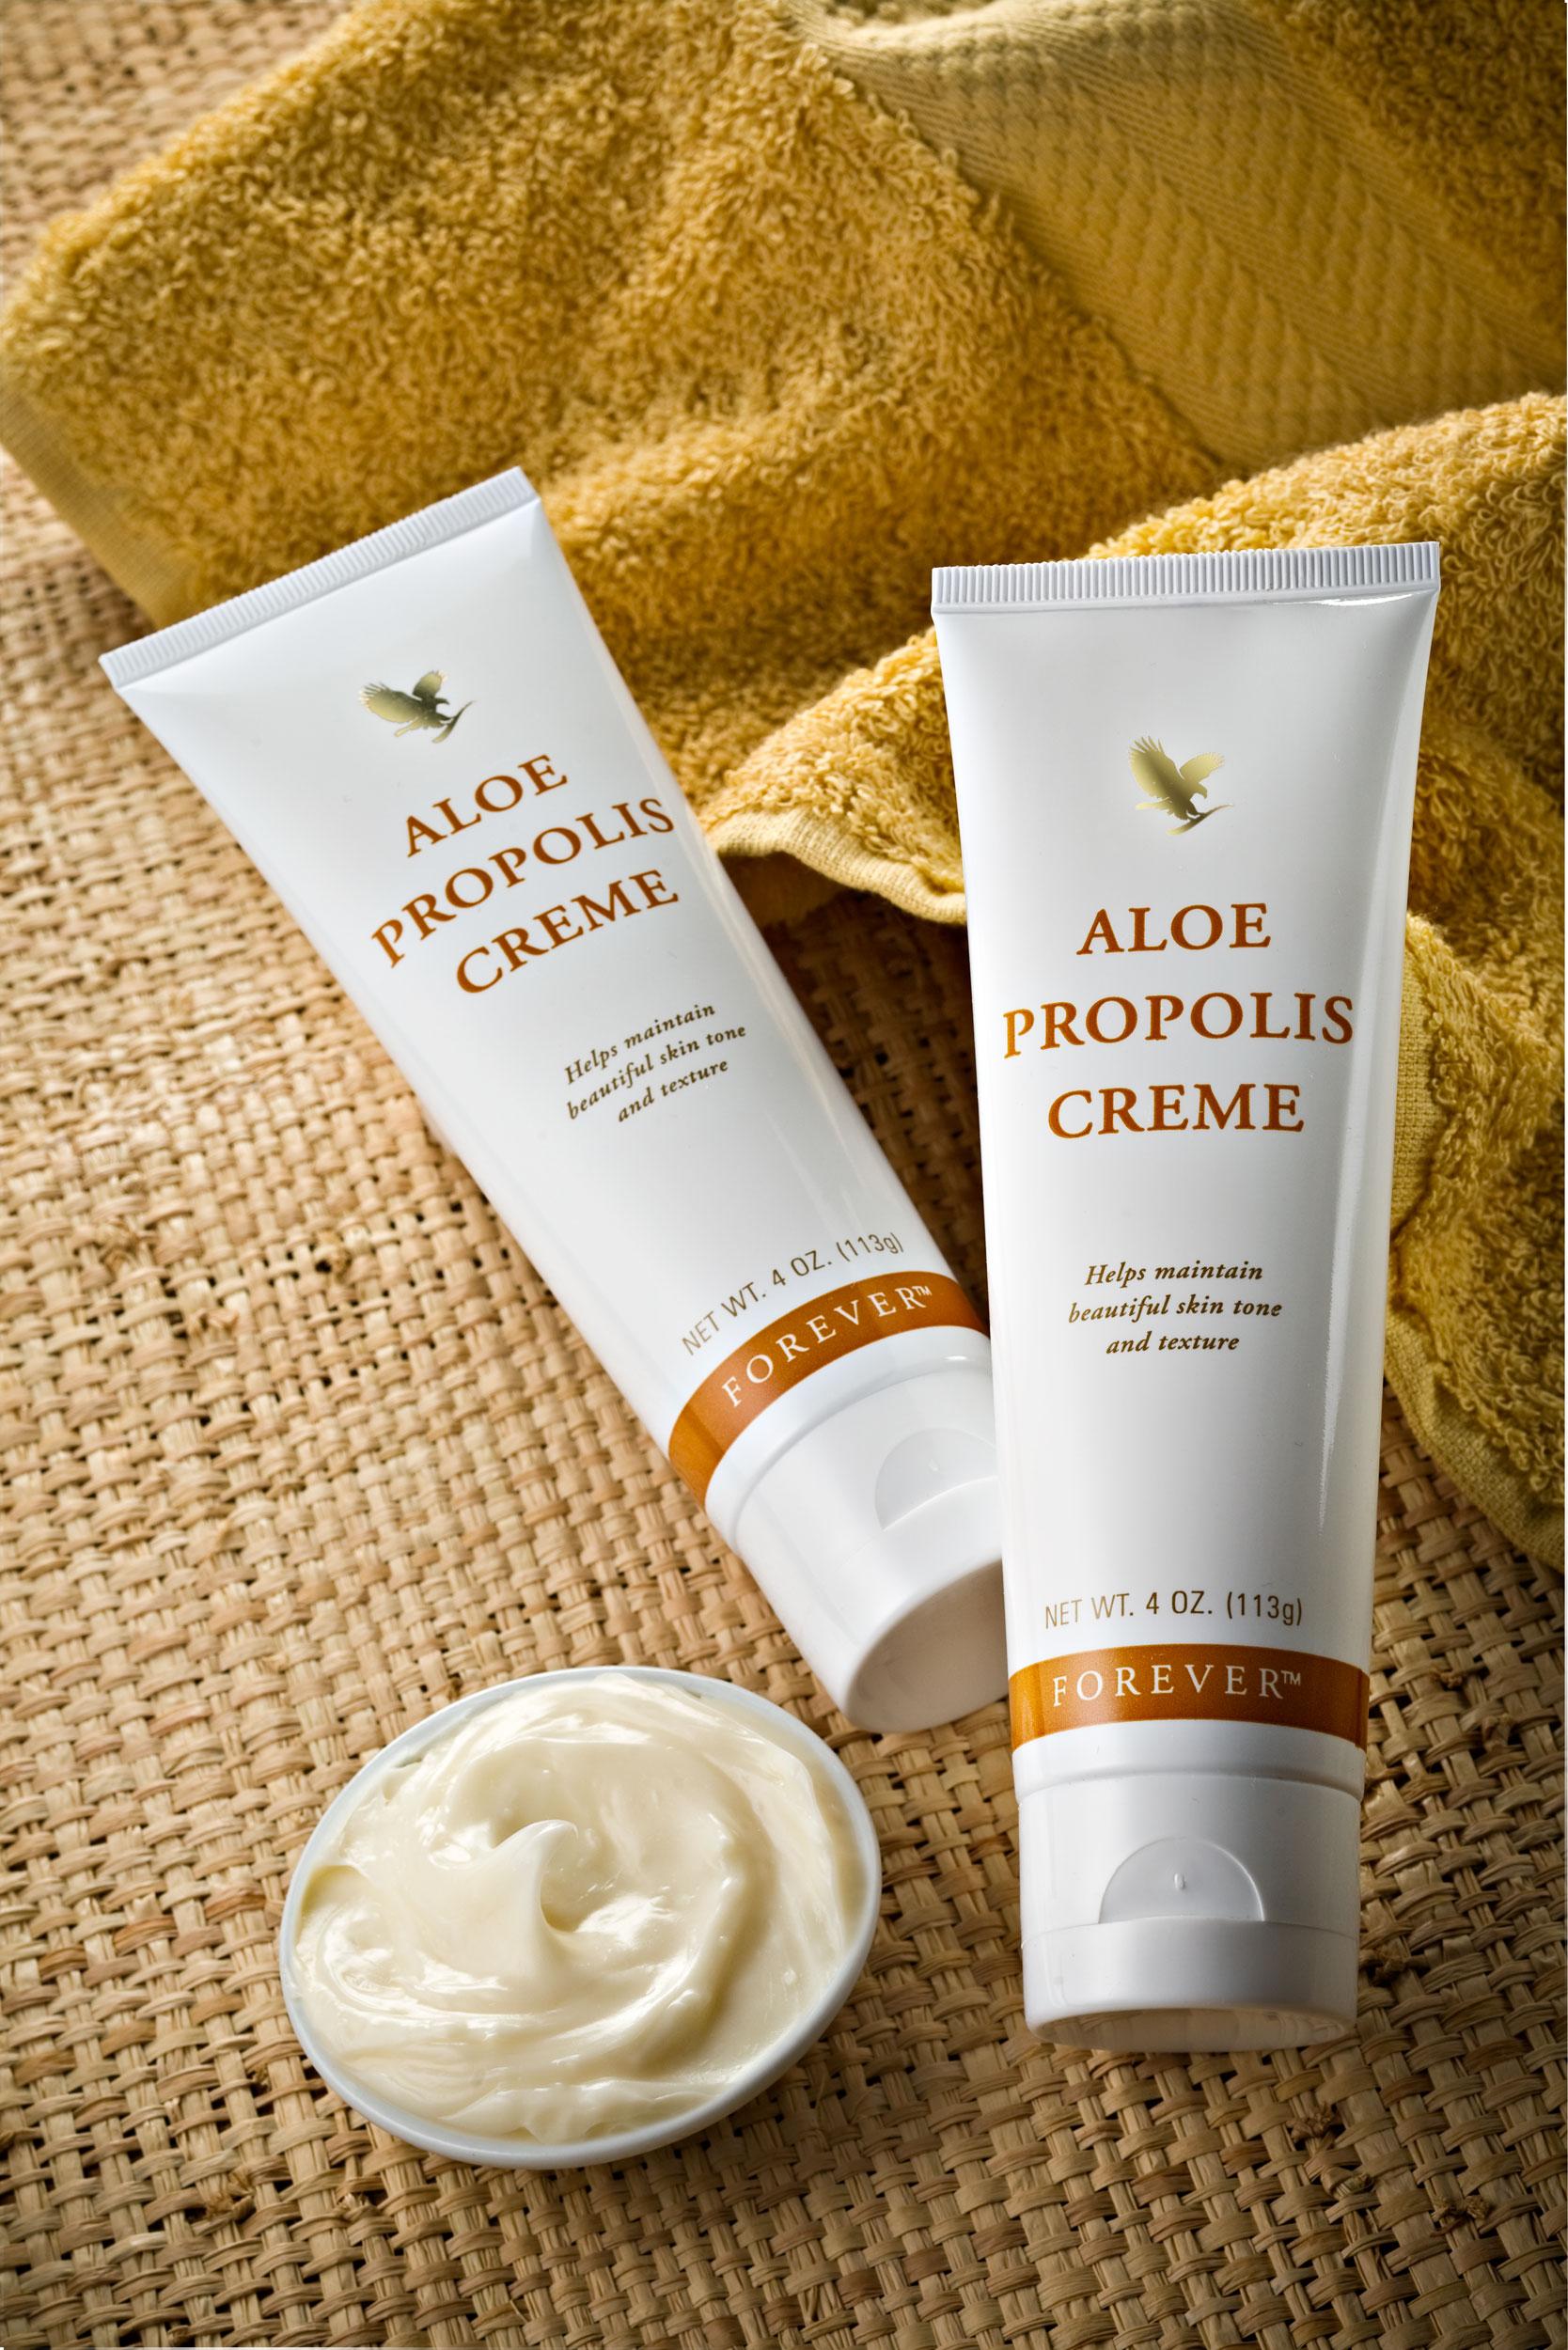 Aloe Vera Propolis Creme - yourbodybase